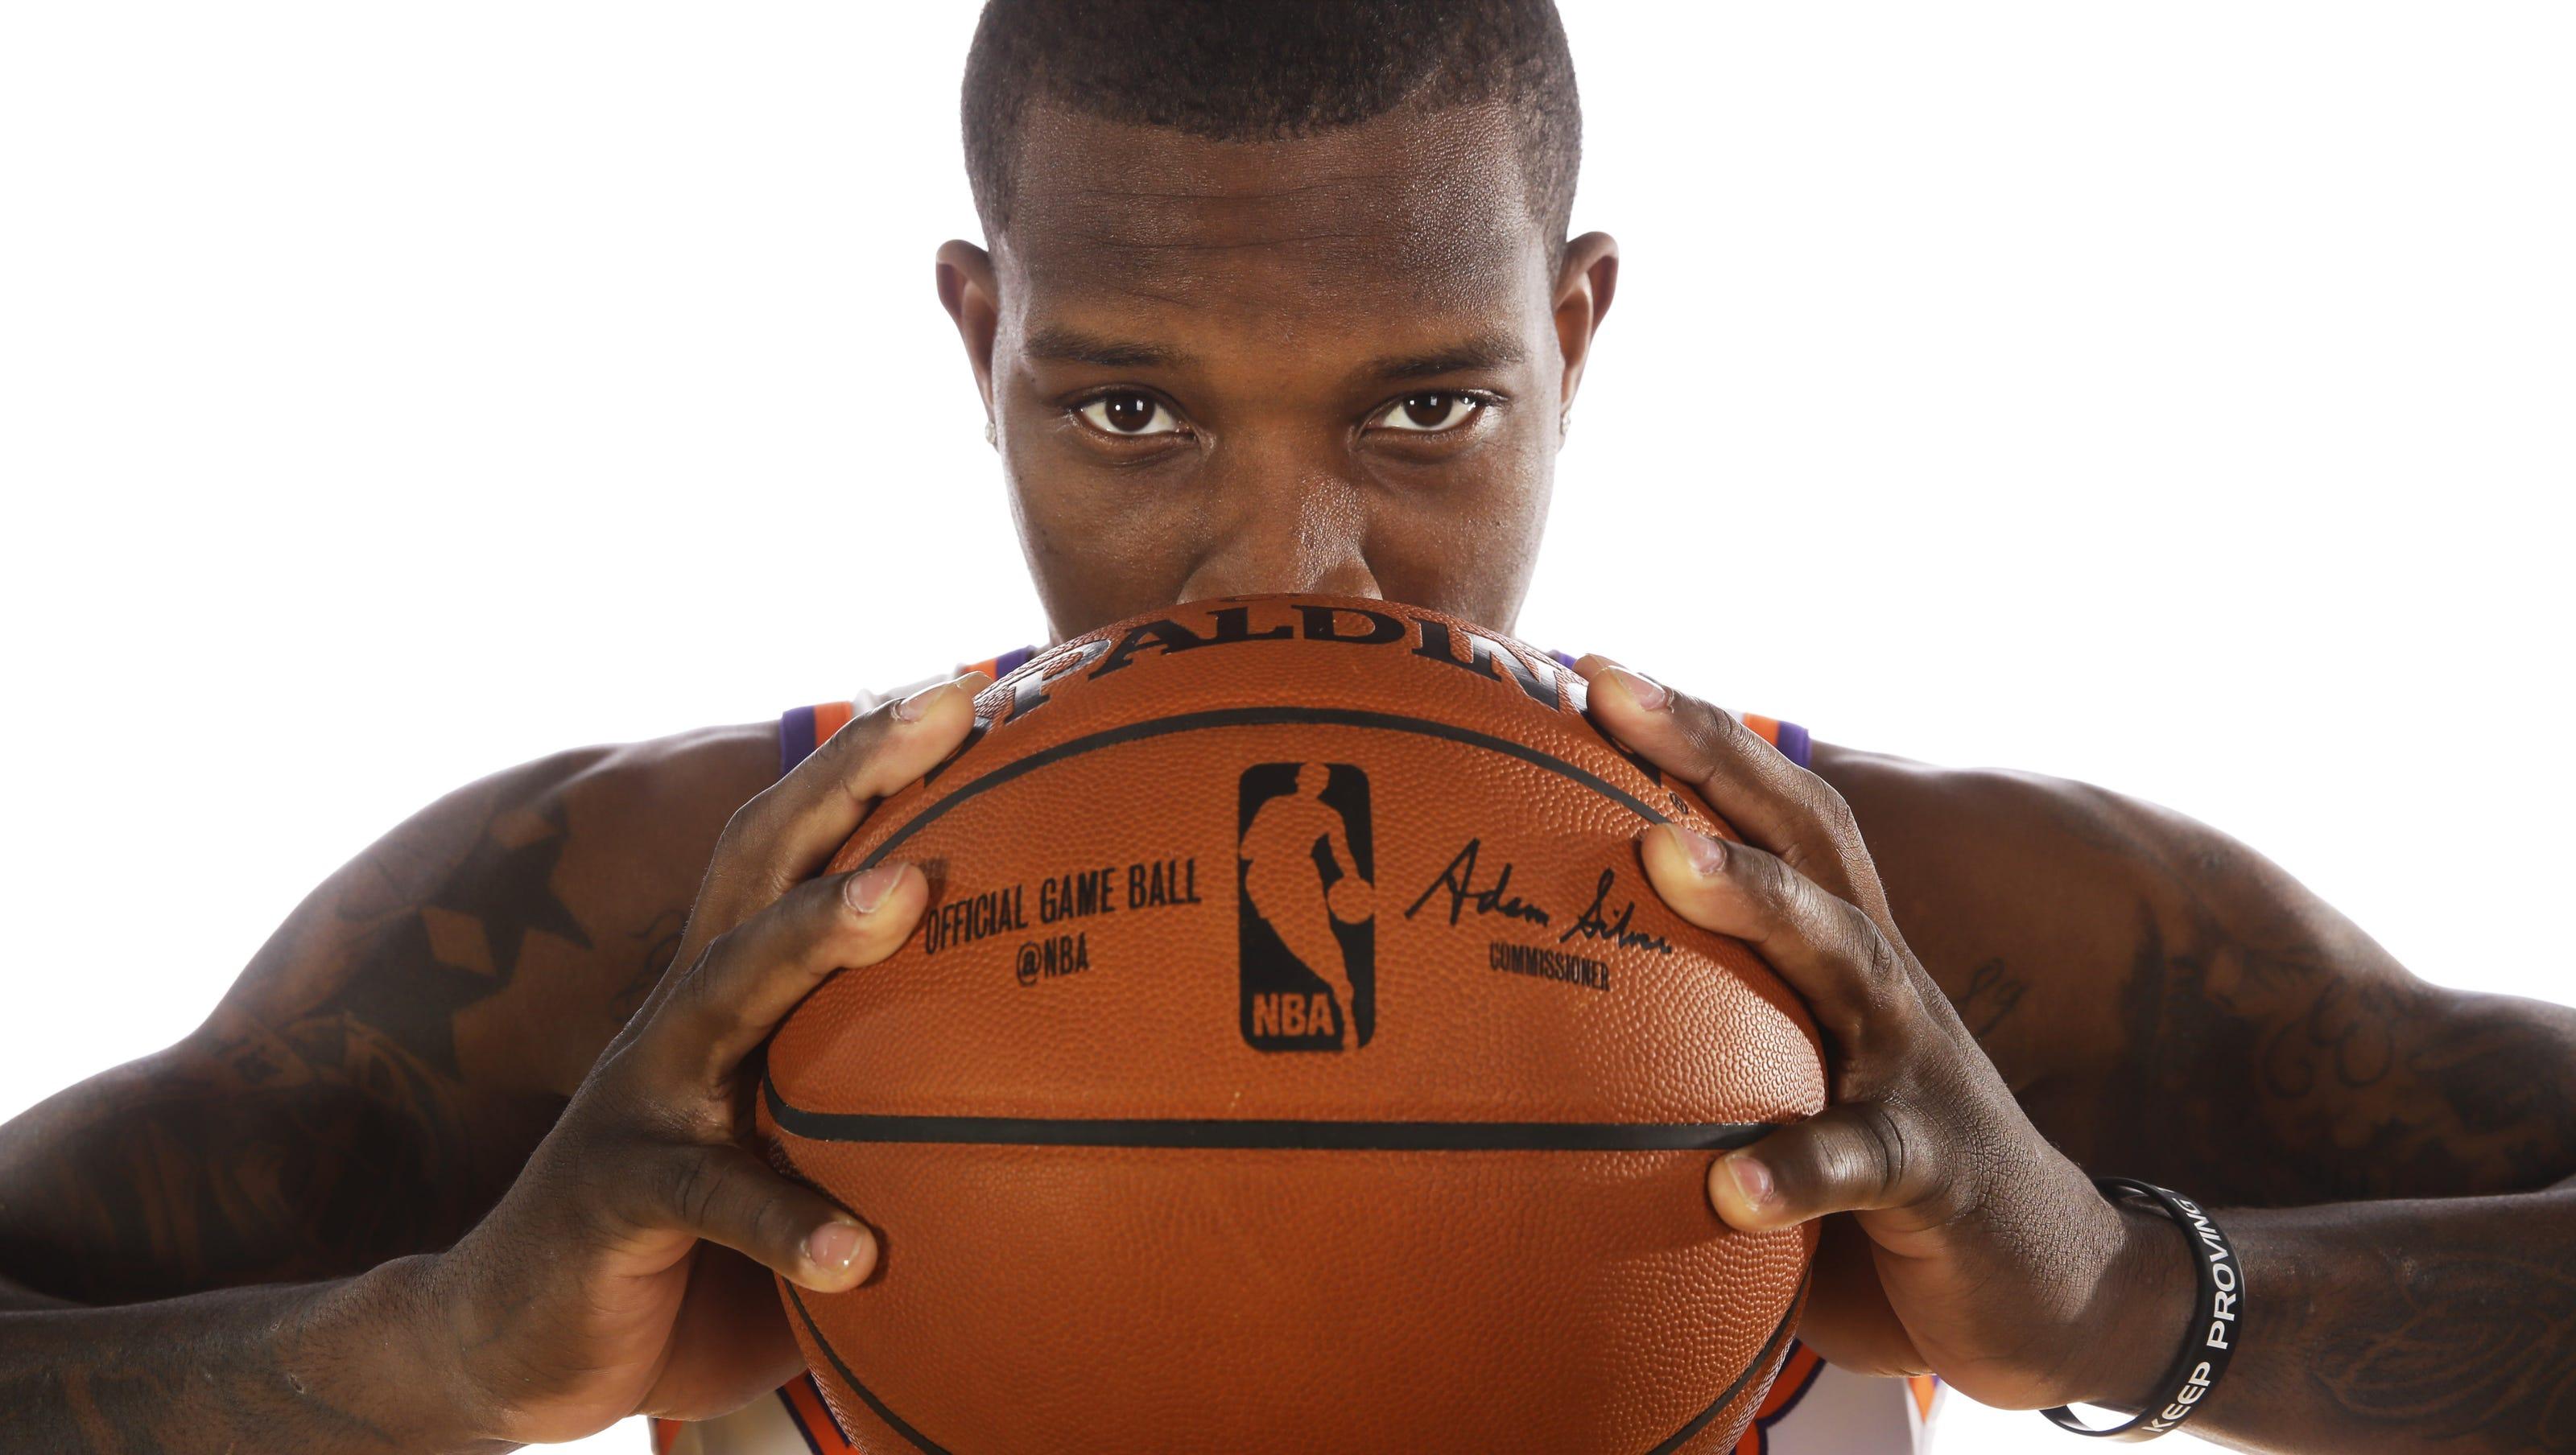 Phoenix Suns Devin Booker Eric Bledsoe Could Share Pg Duties